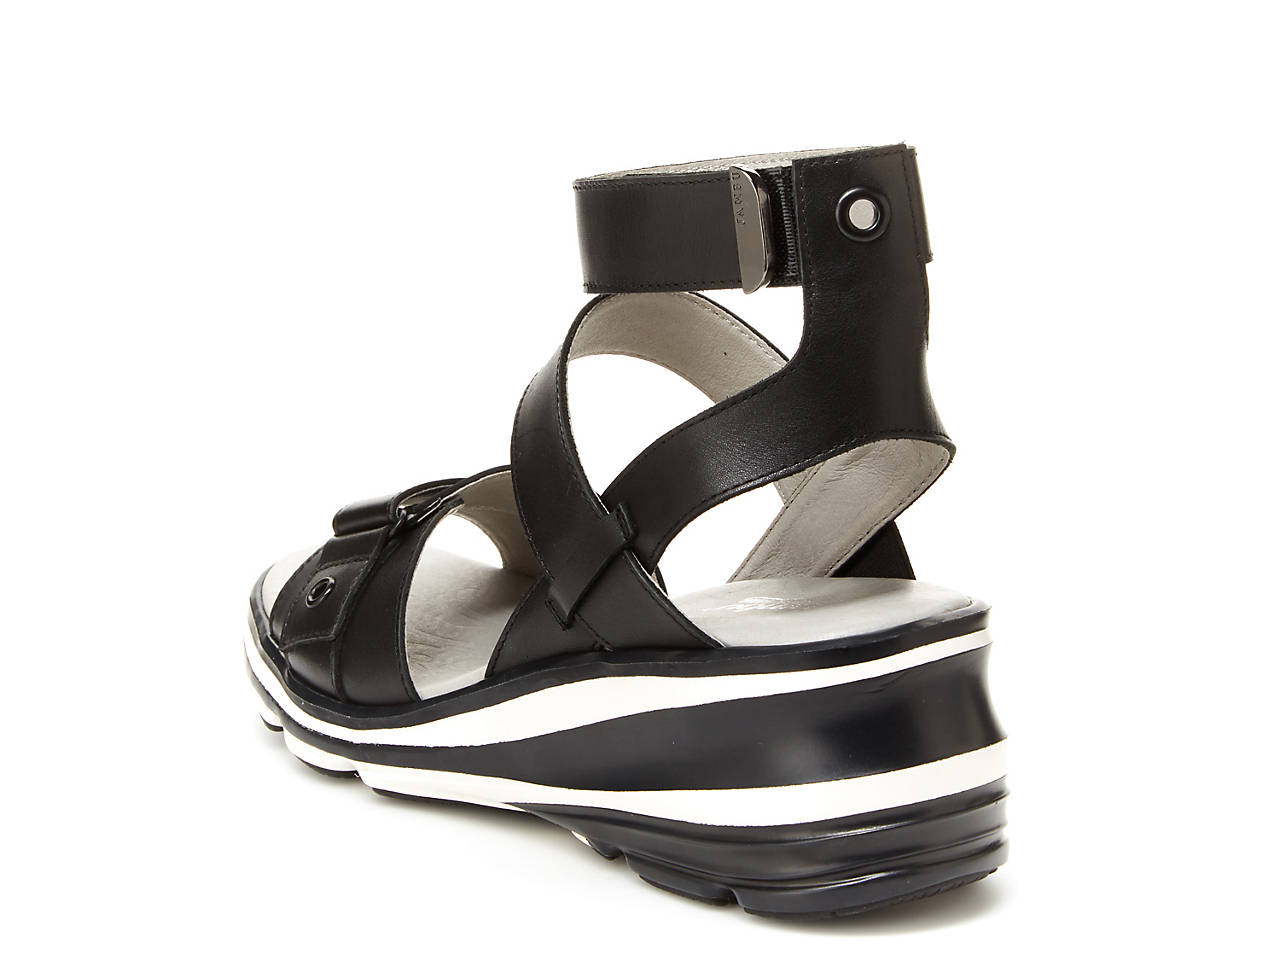 b96b2770607 Jambu Coast Wedge Sandal Women s Shoes